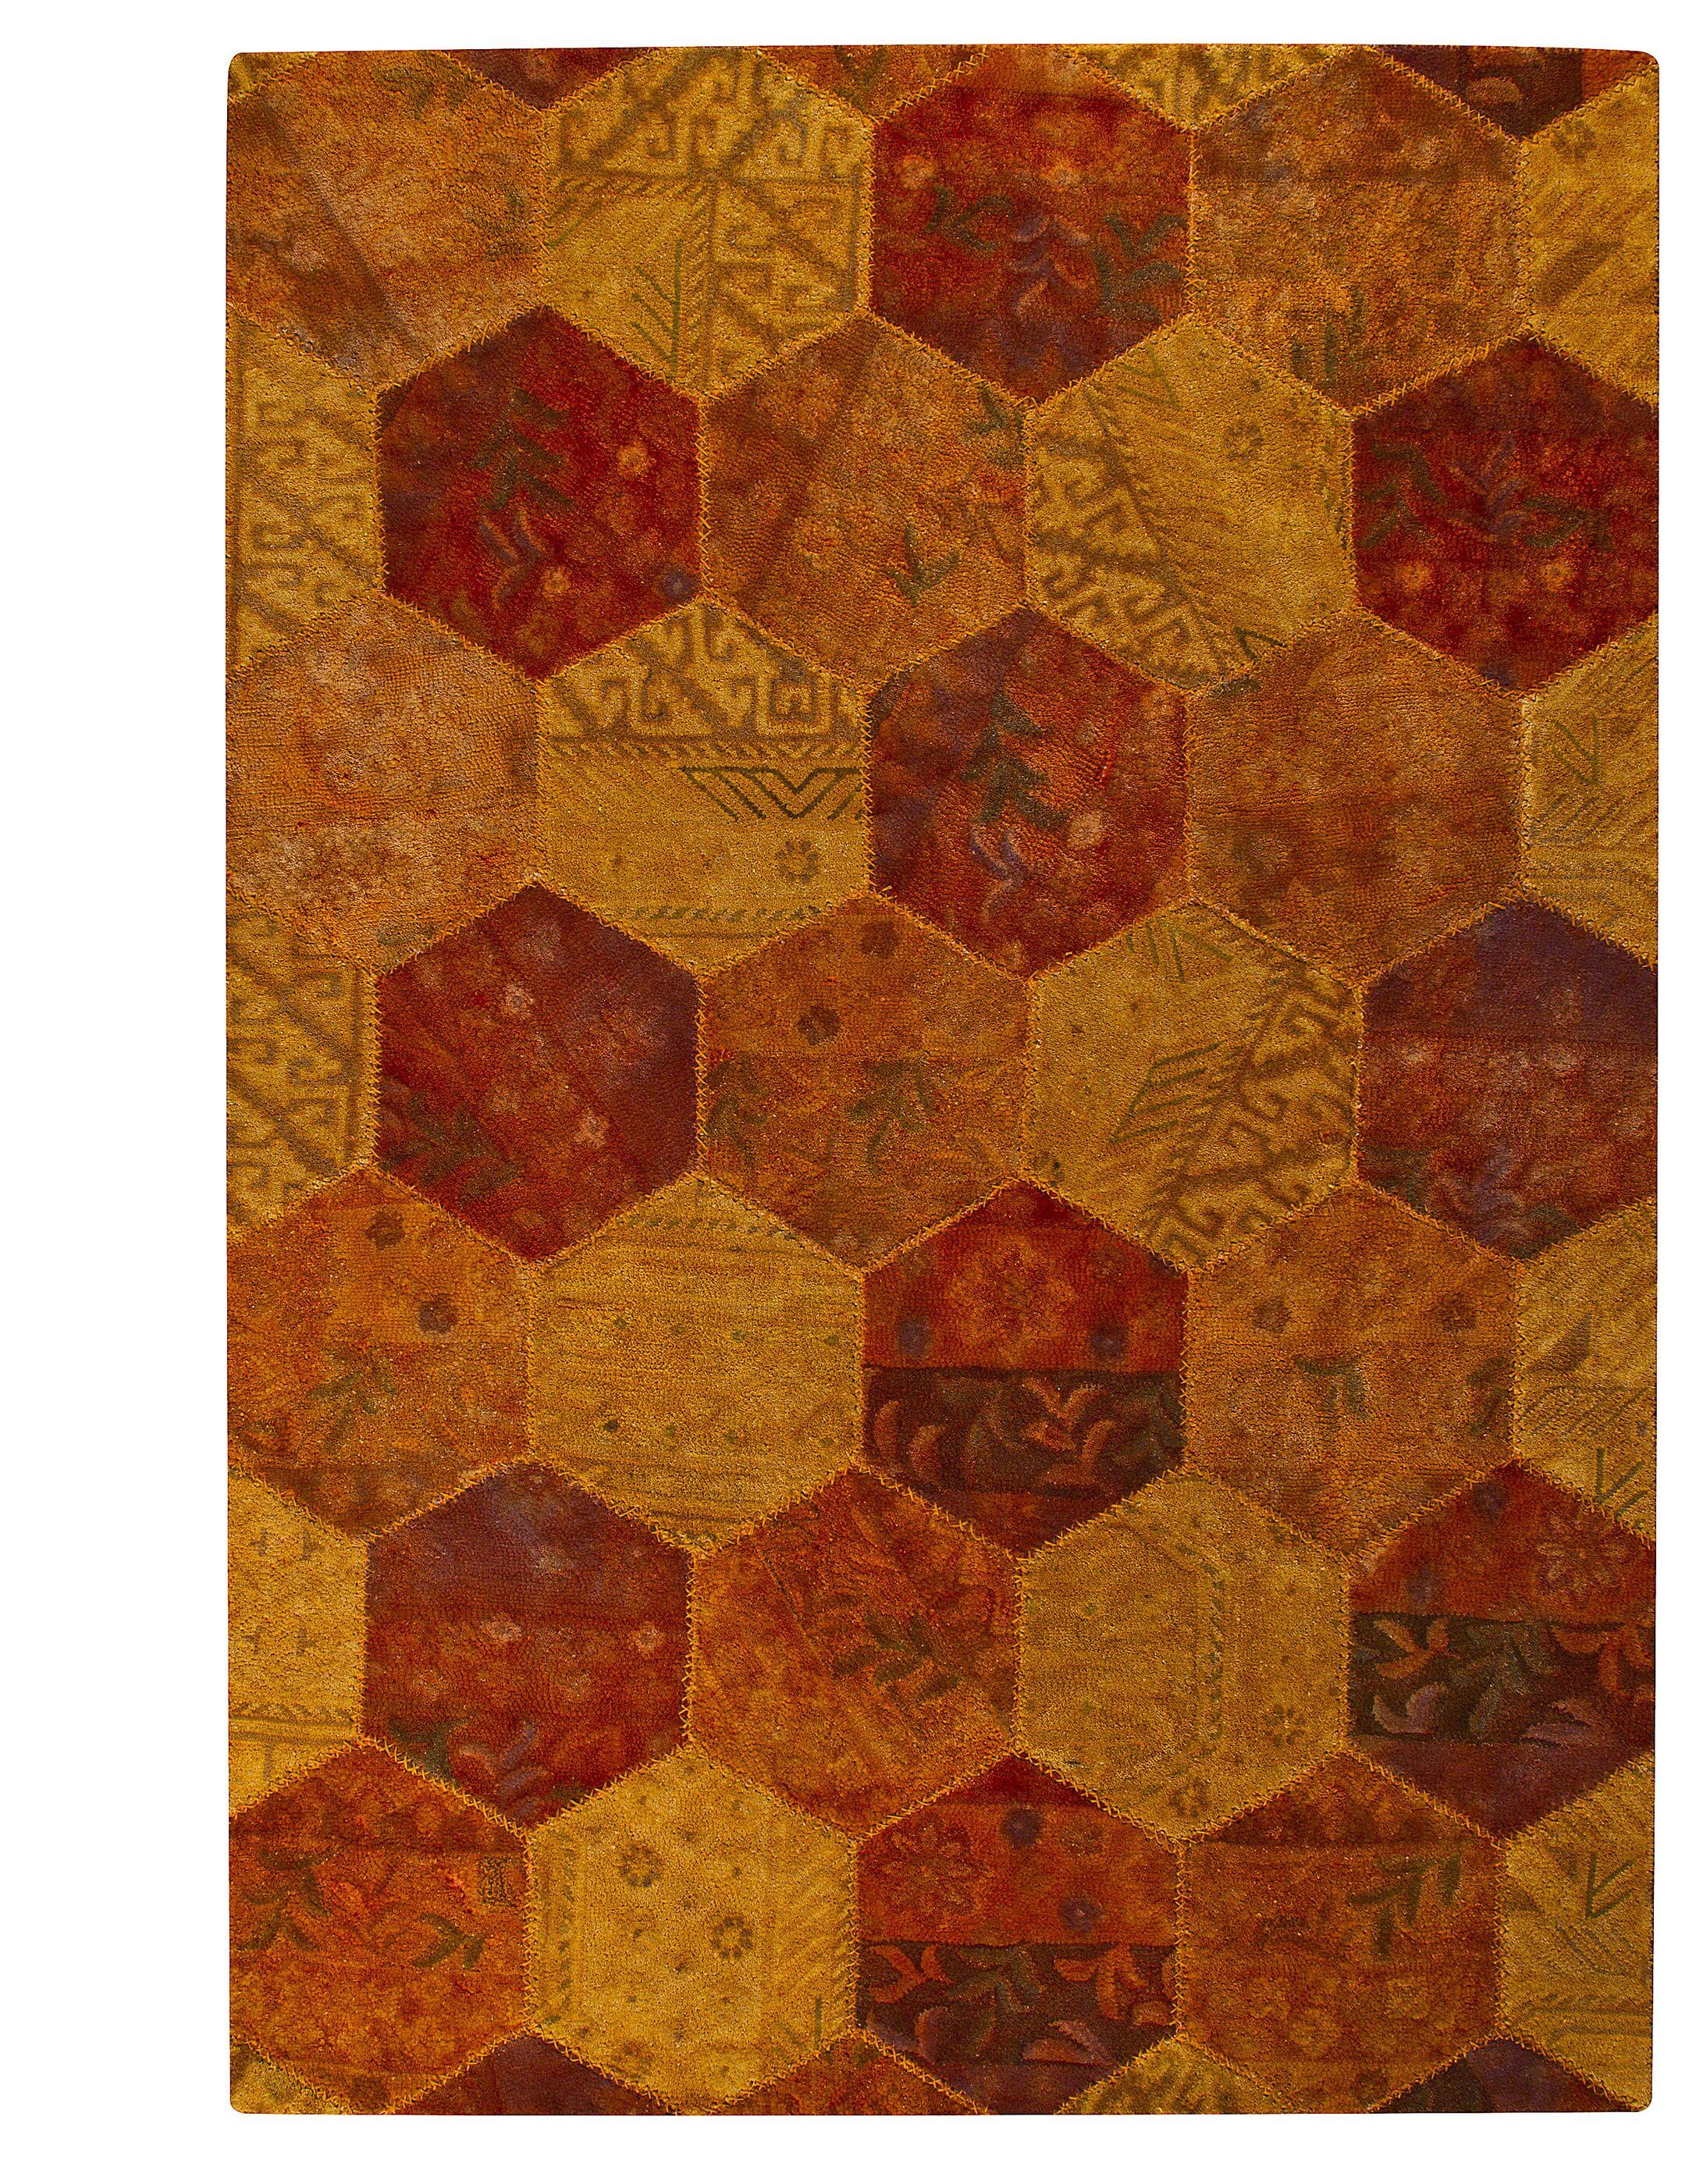 Dungate Honey Comb Orange Area Rug Rug Size: 5'2